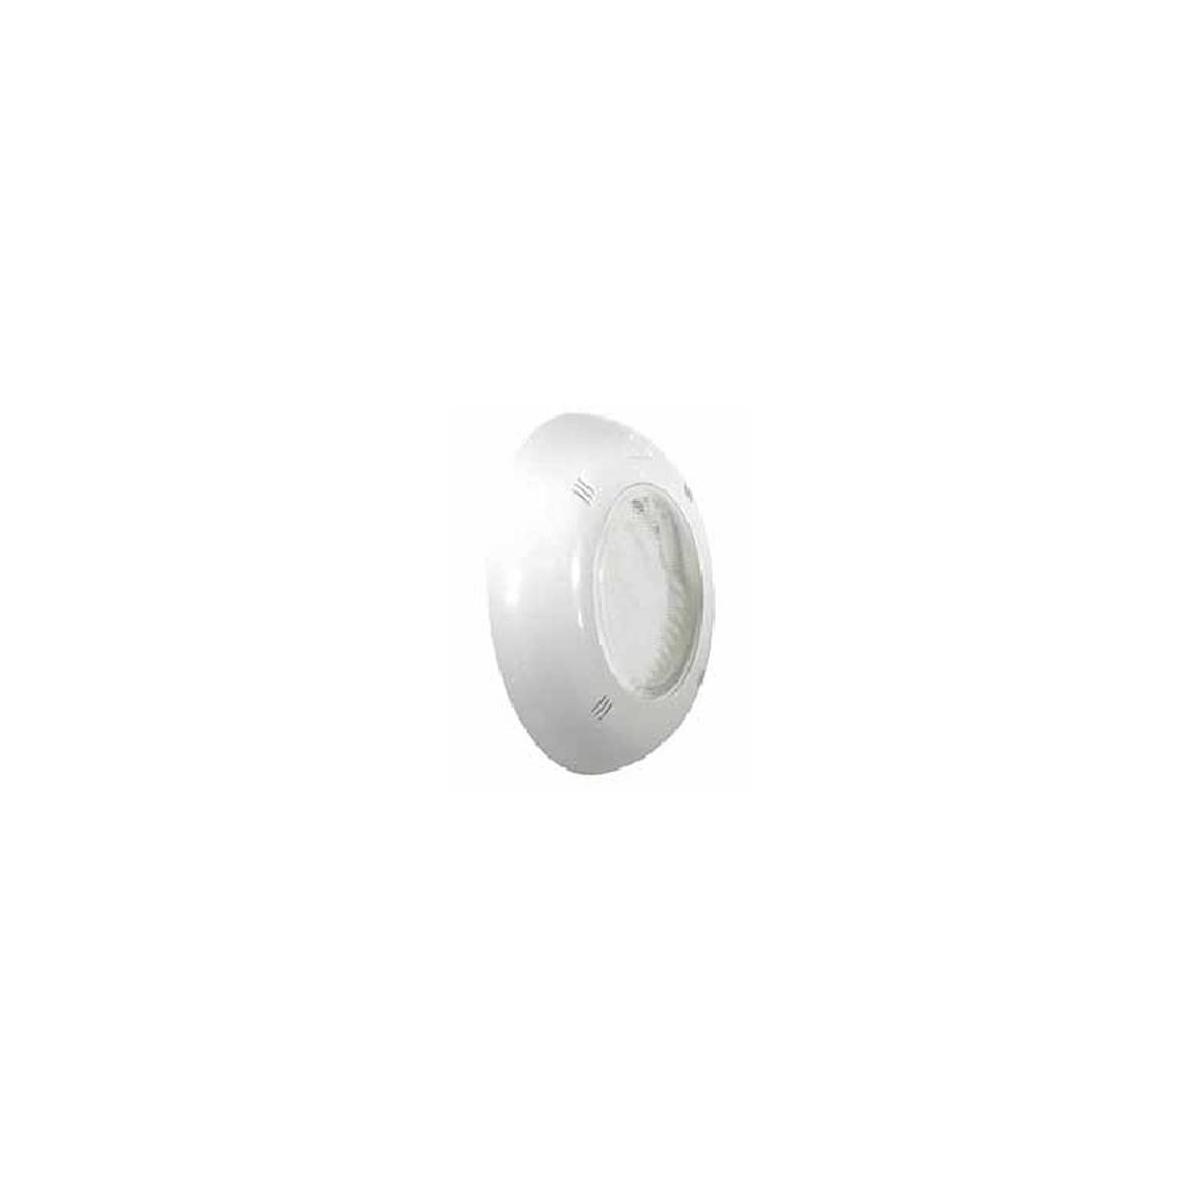 Proyector S-LIM 1.11 - Piscina prefabricada